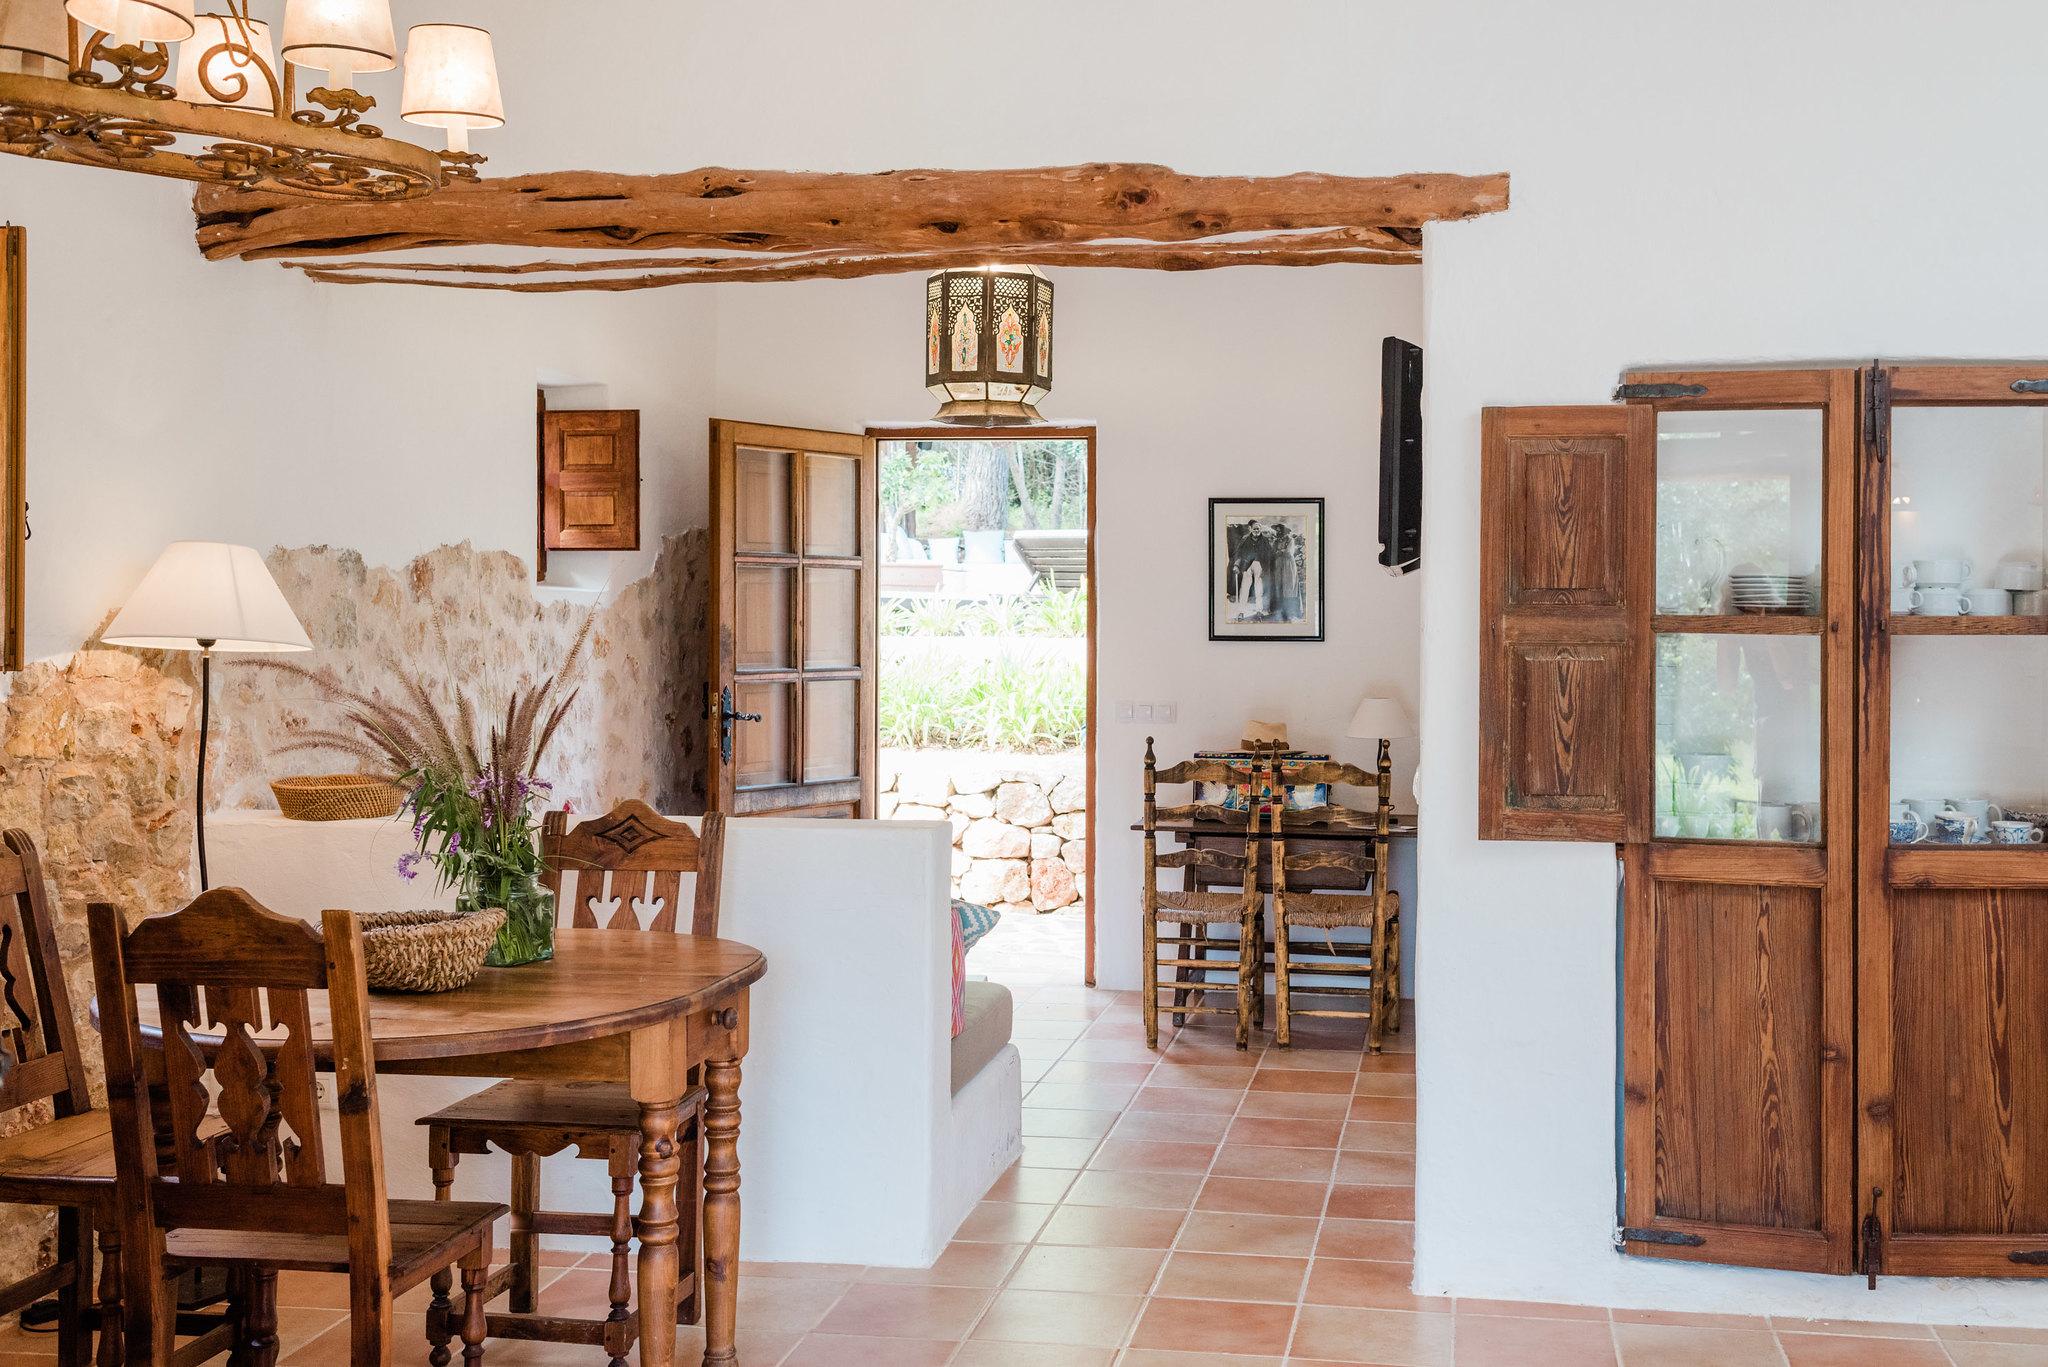 https://www.white-ibiza.com/wp-content/uploads/2020/05/white-ibiza-villas-can-sabina-interior.jpg